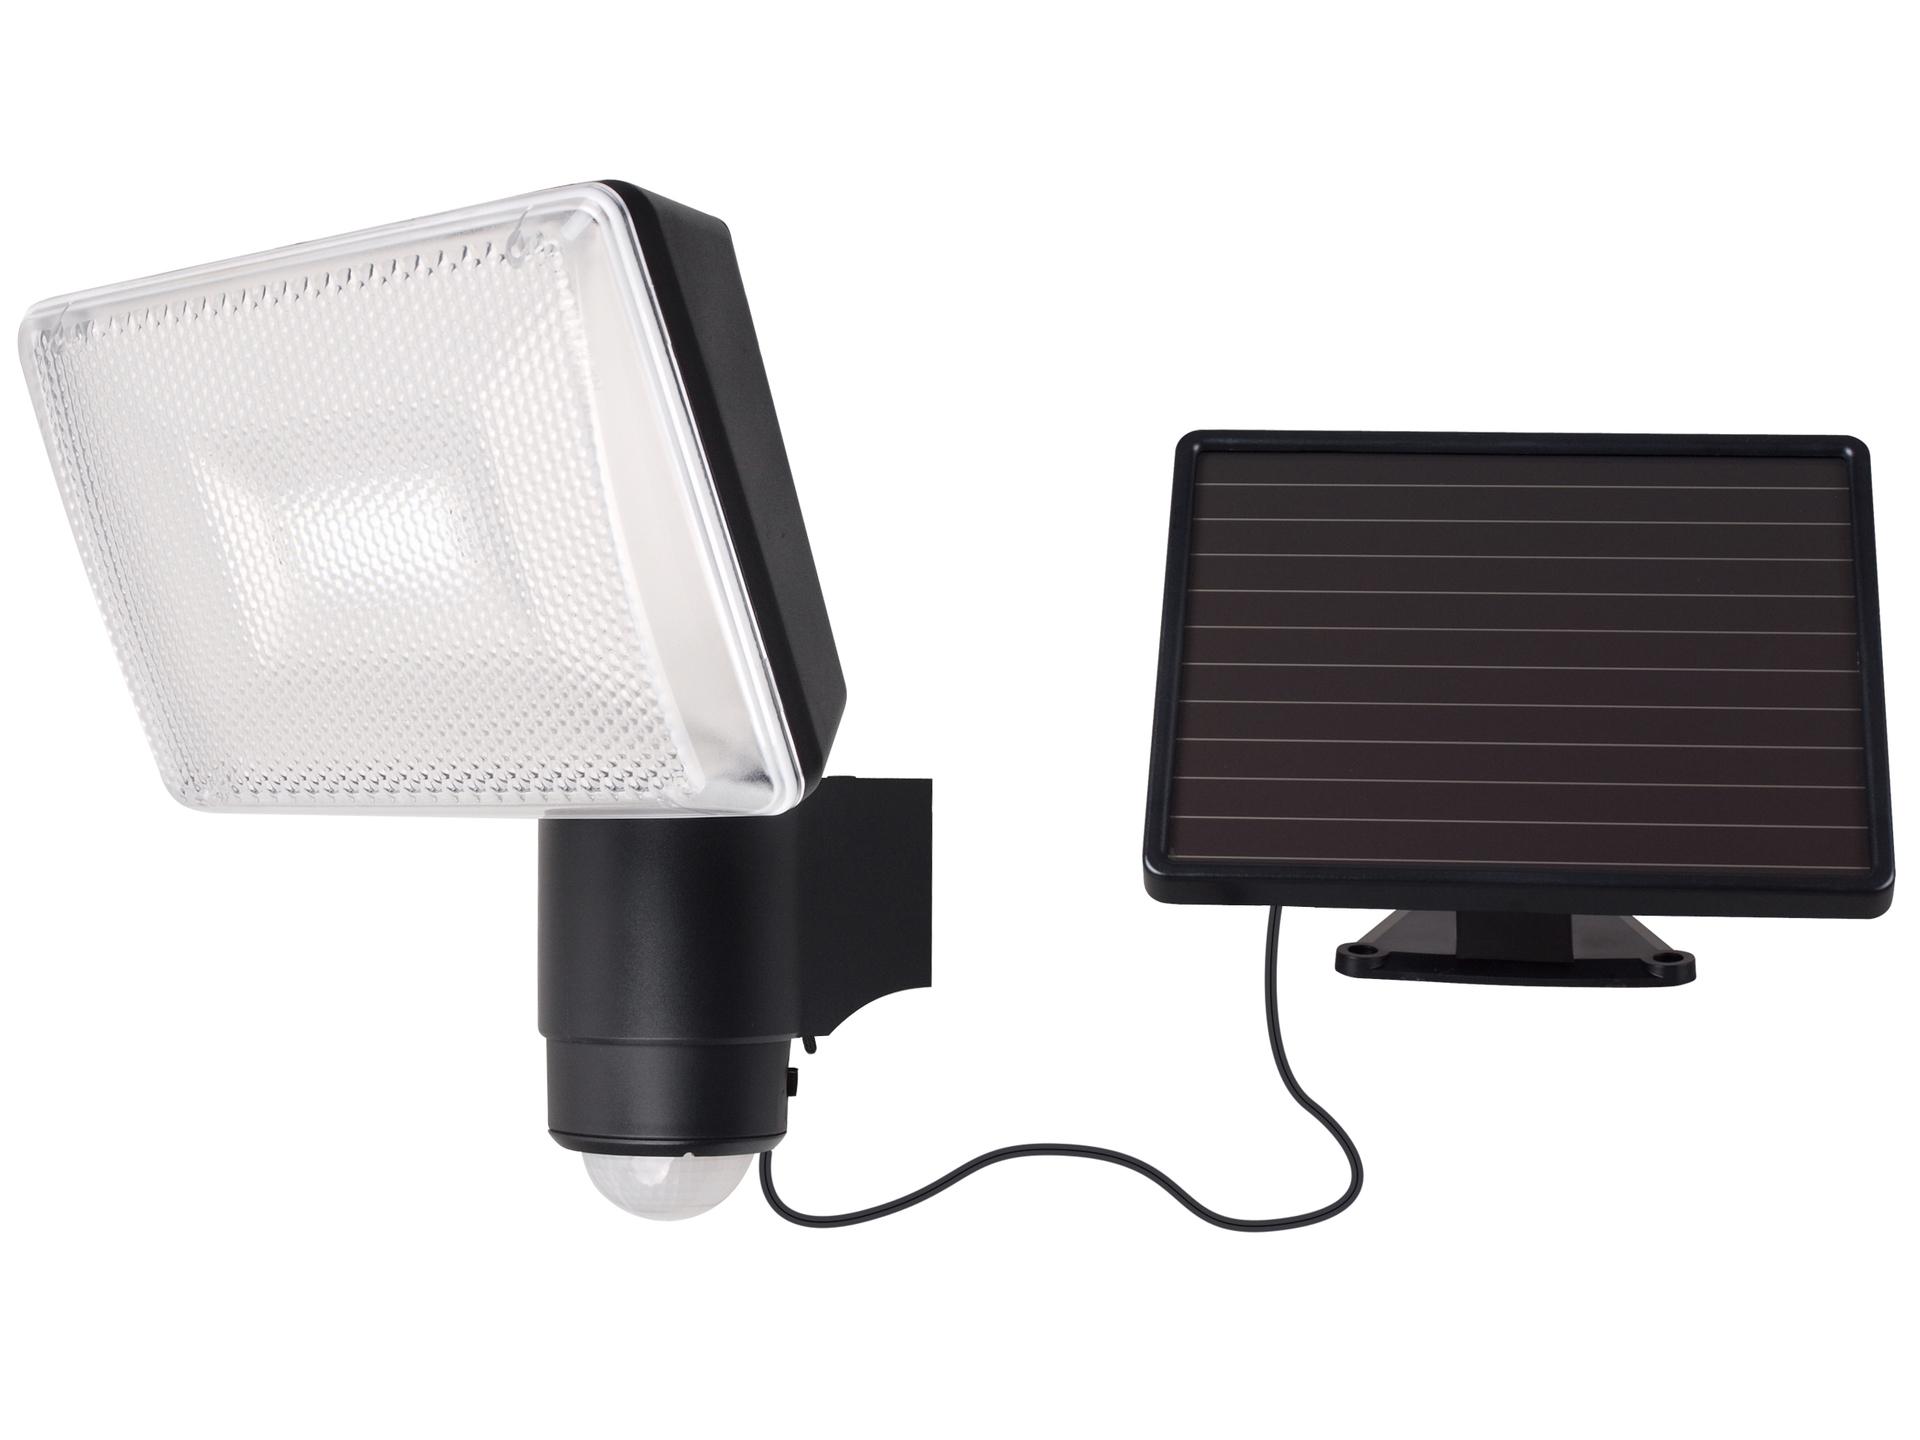 Buitenverlichting op zonne-energie | Hubo